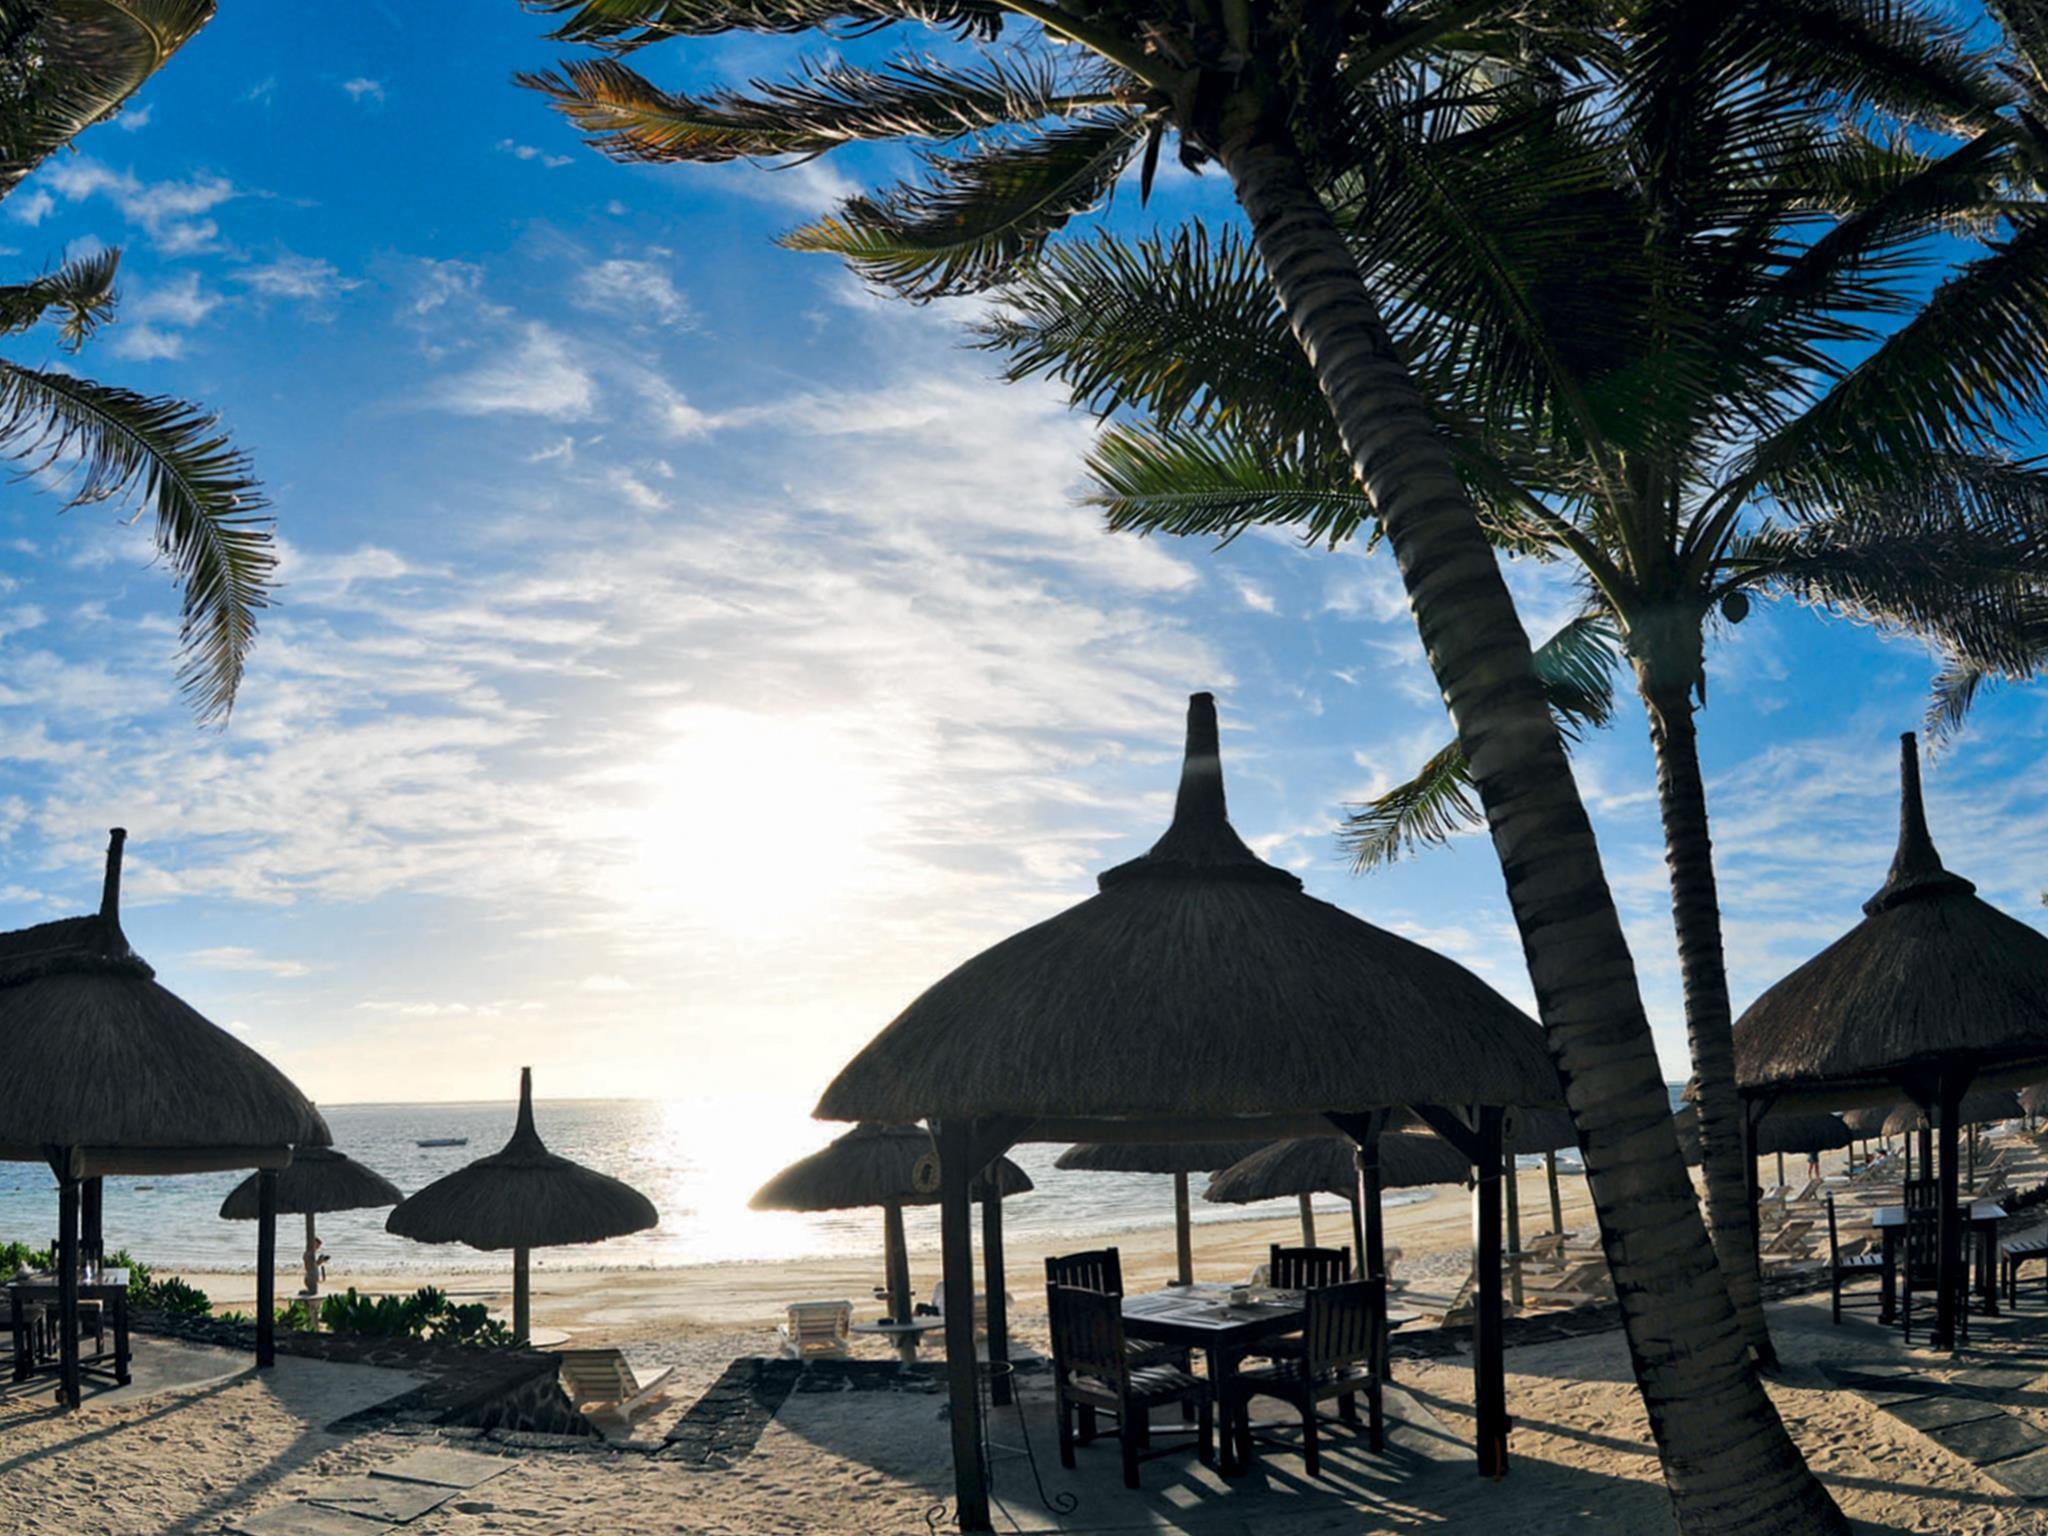 Veranda Palmar Beach Hotel Belle Mare Mauritius Compare Deals